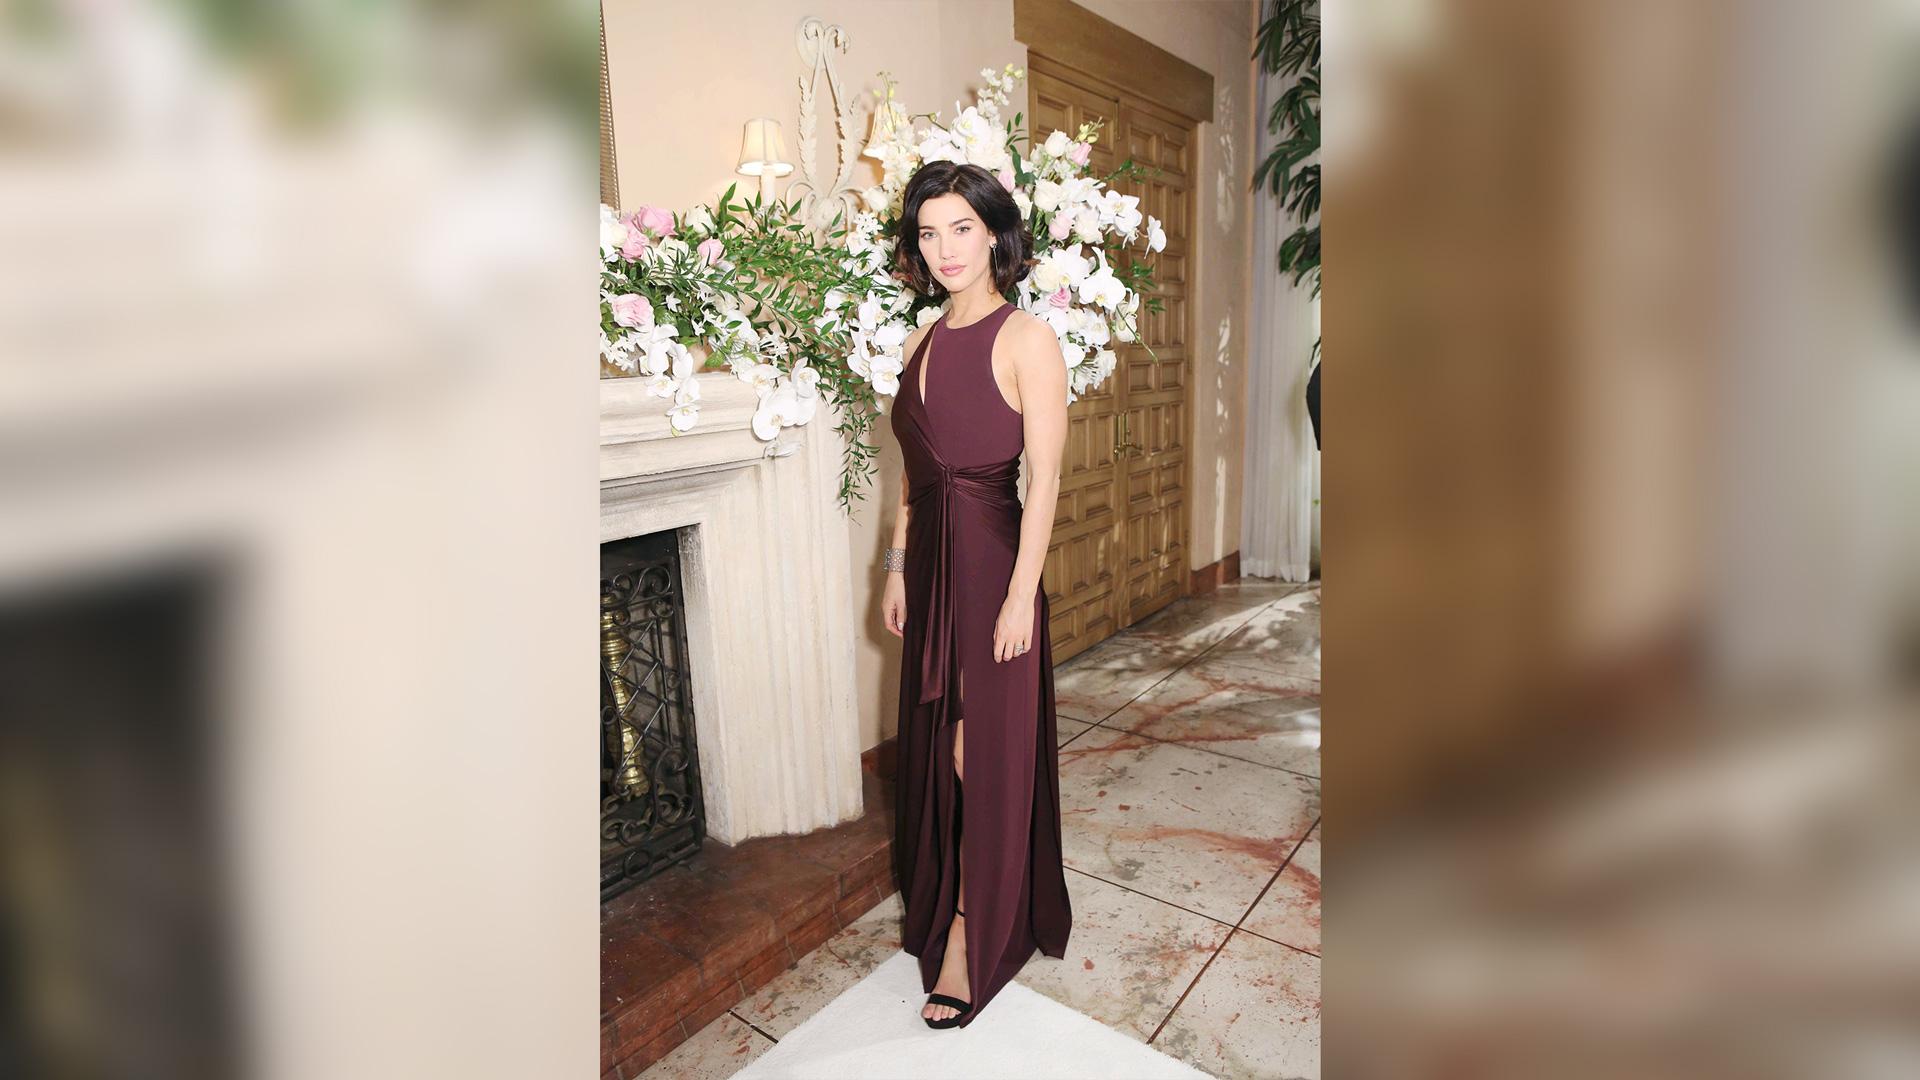 Steffy Forrester (Jacqueline MacInnes Wood) in a stunning evening dress.